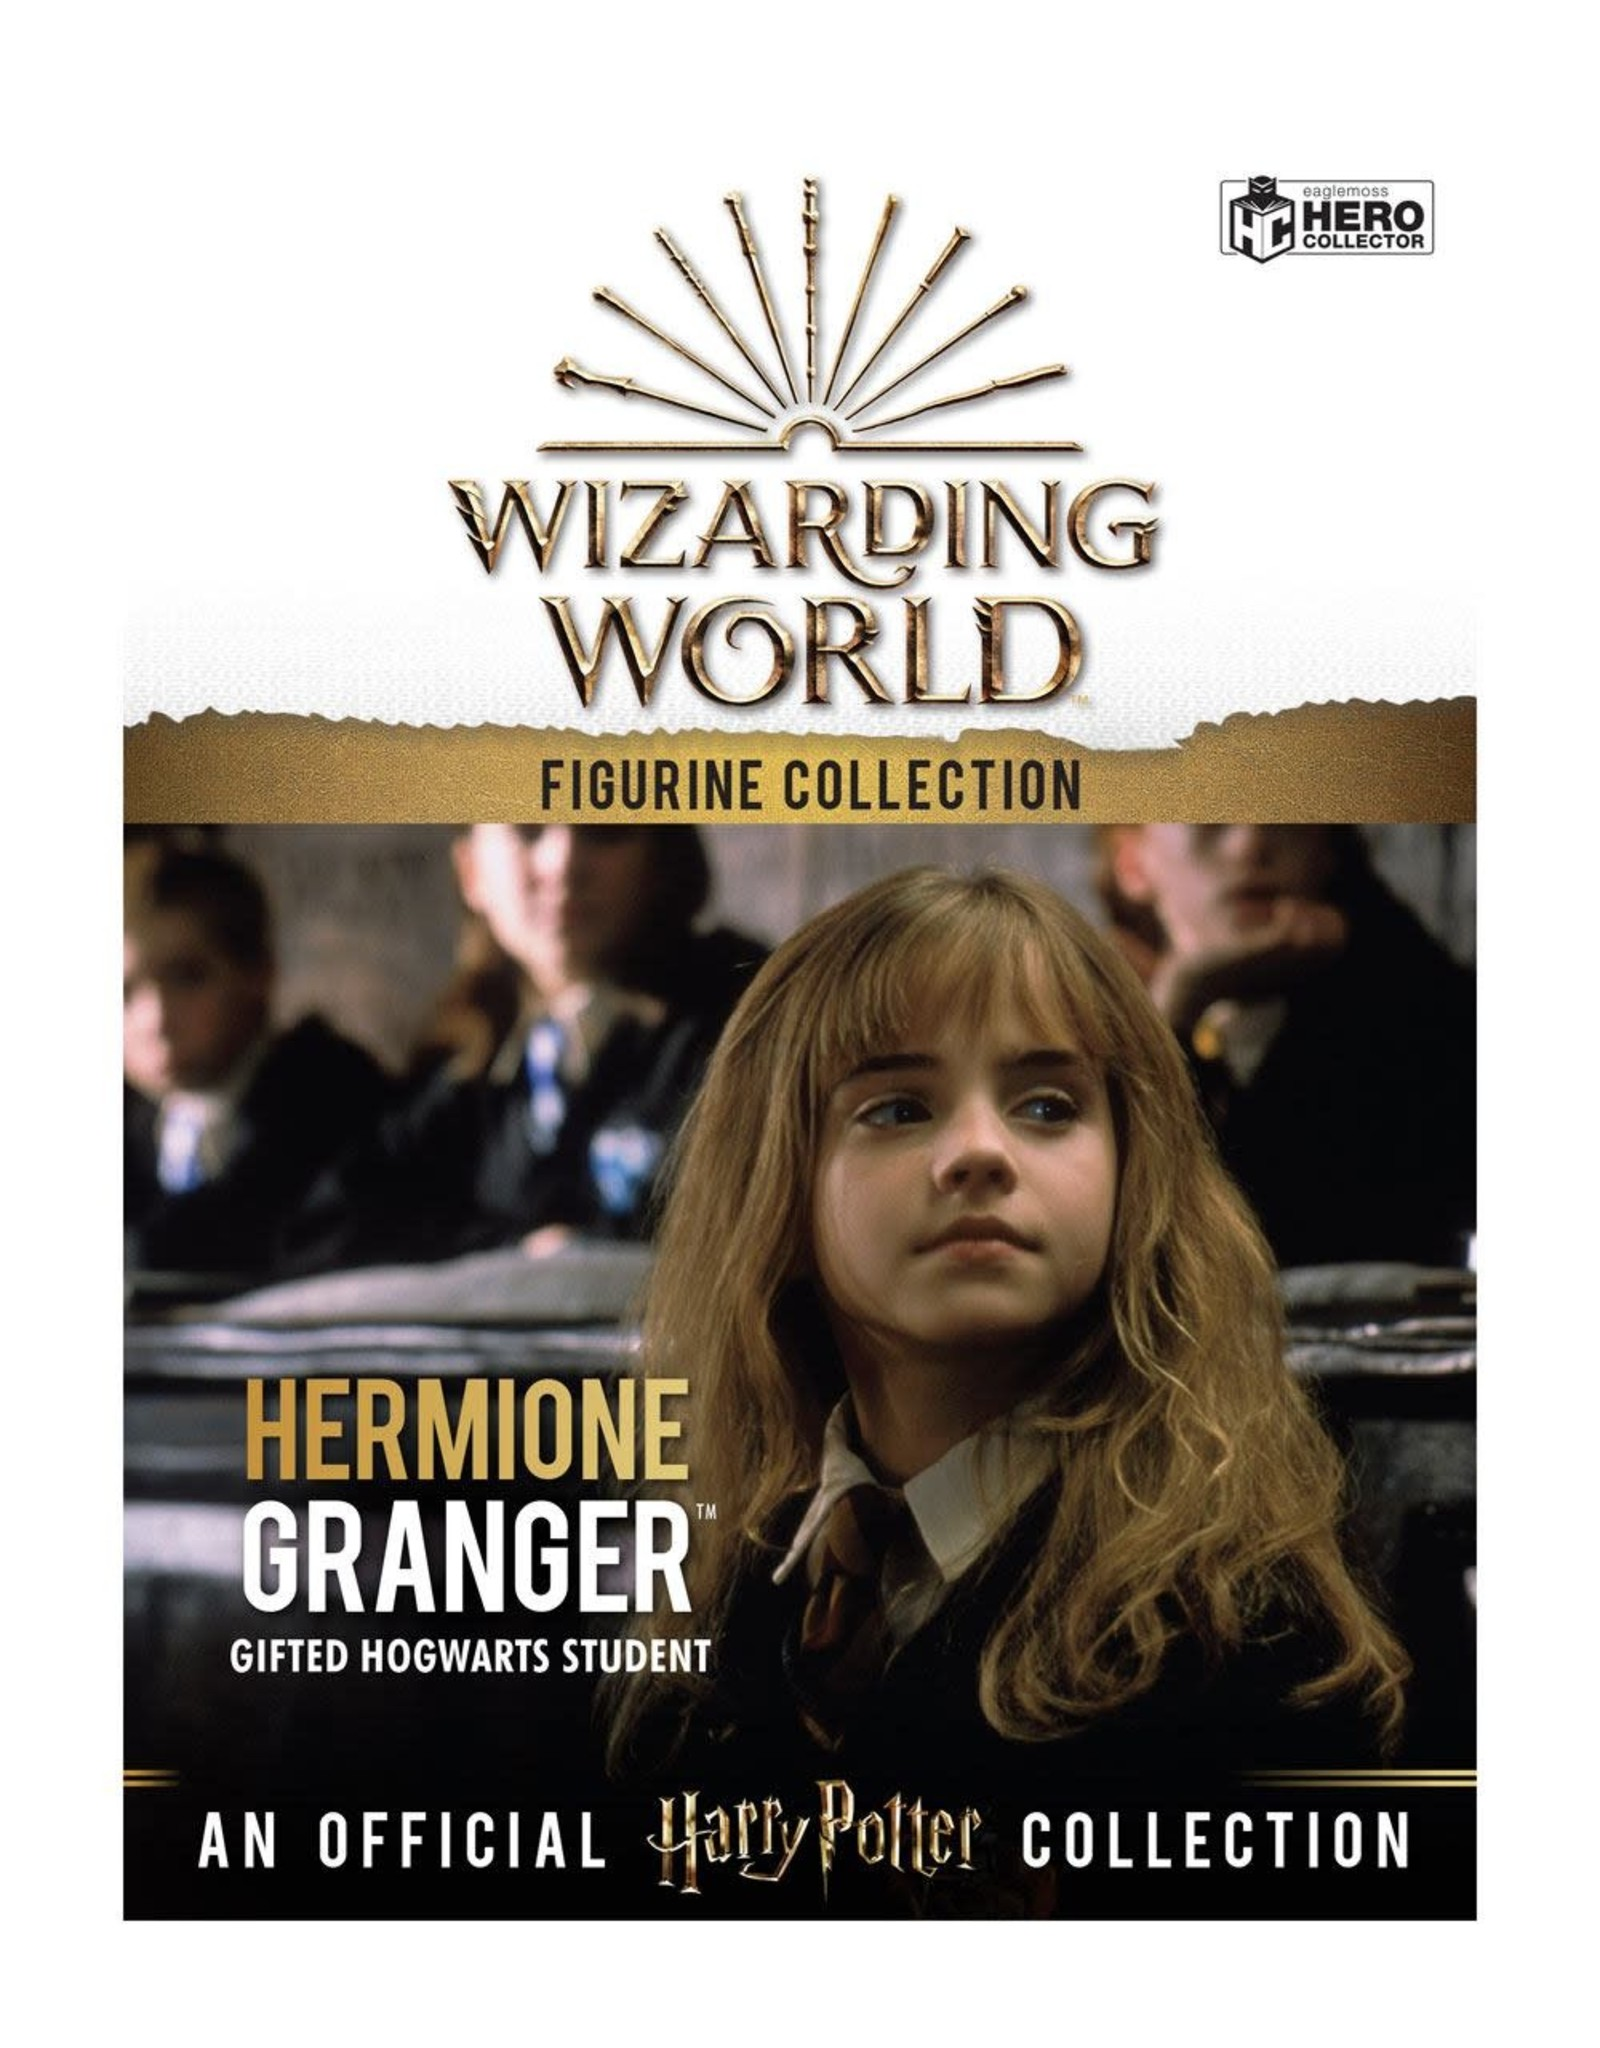 WIZARDING WORLD FIGURE - HARRY POTTER - Hermione Granger - 9cm